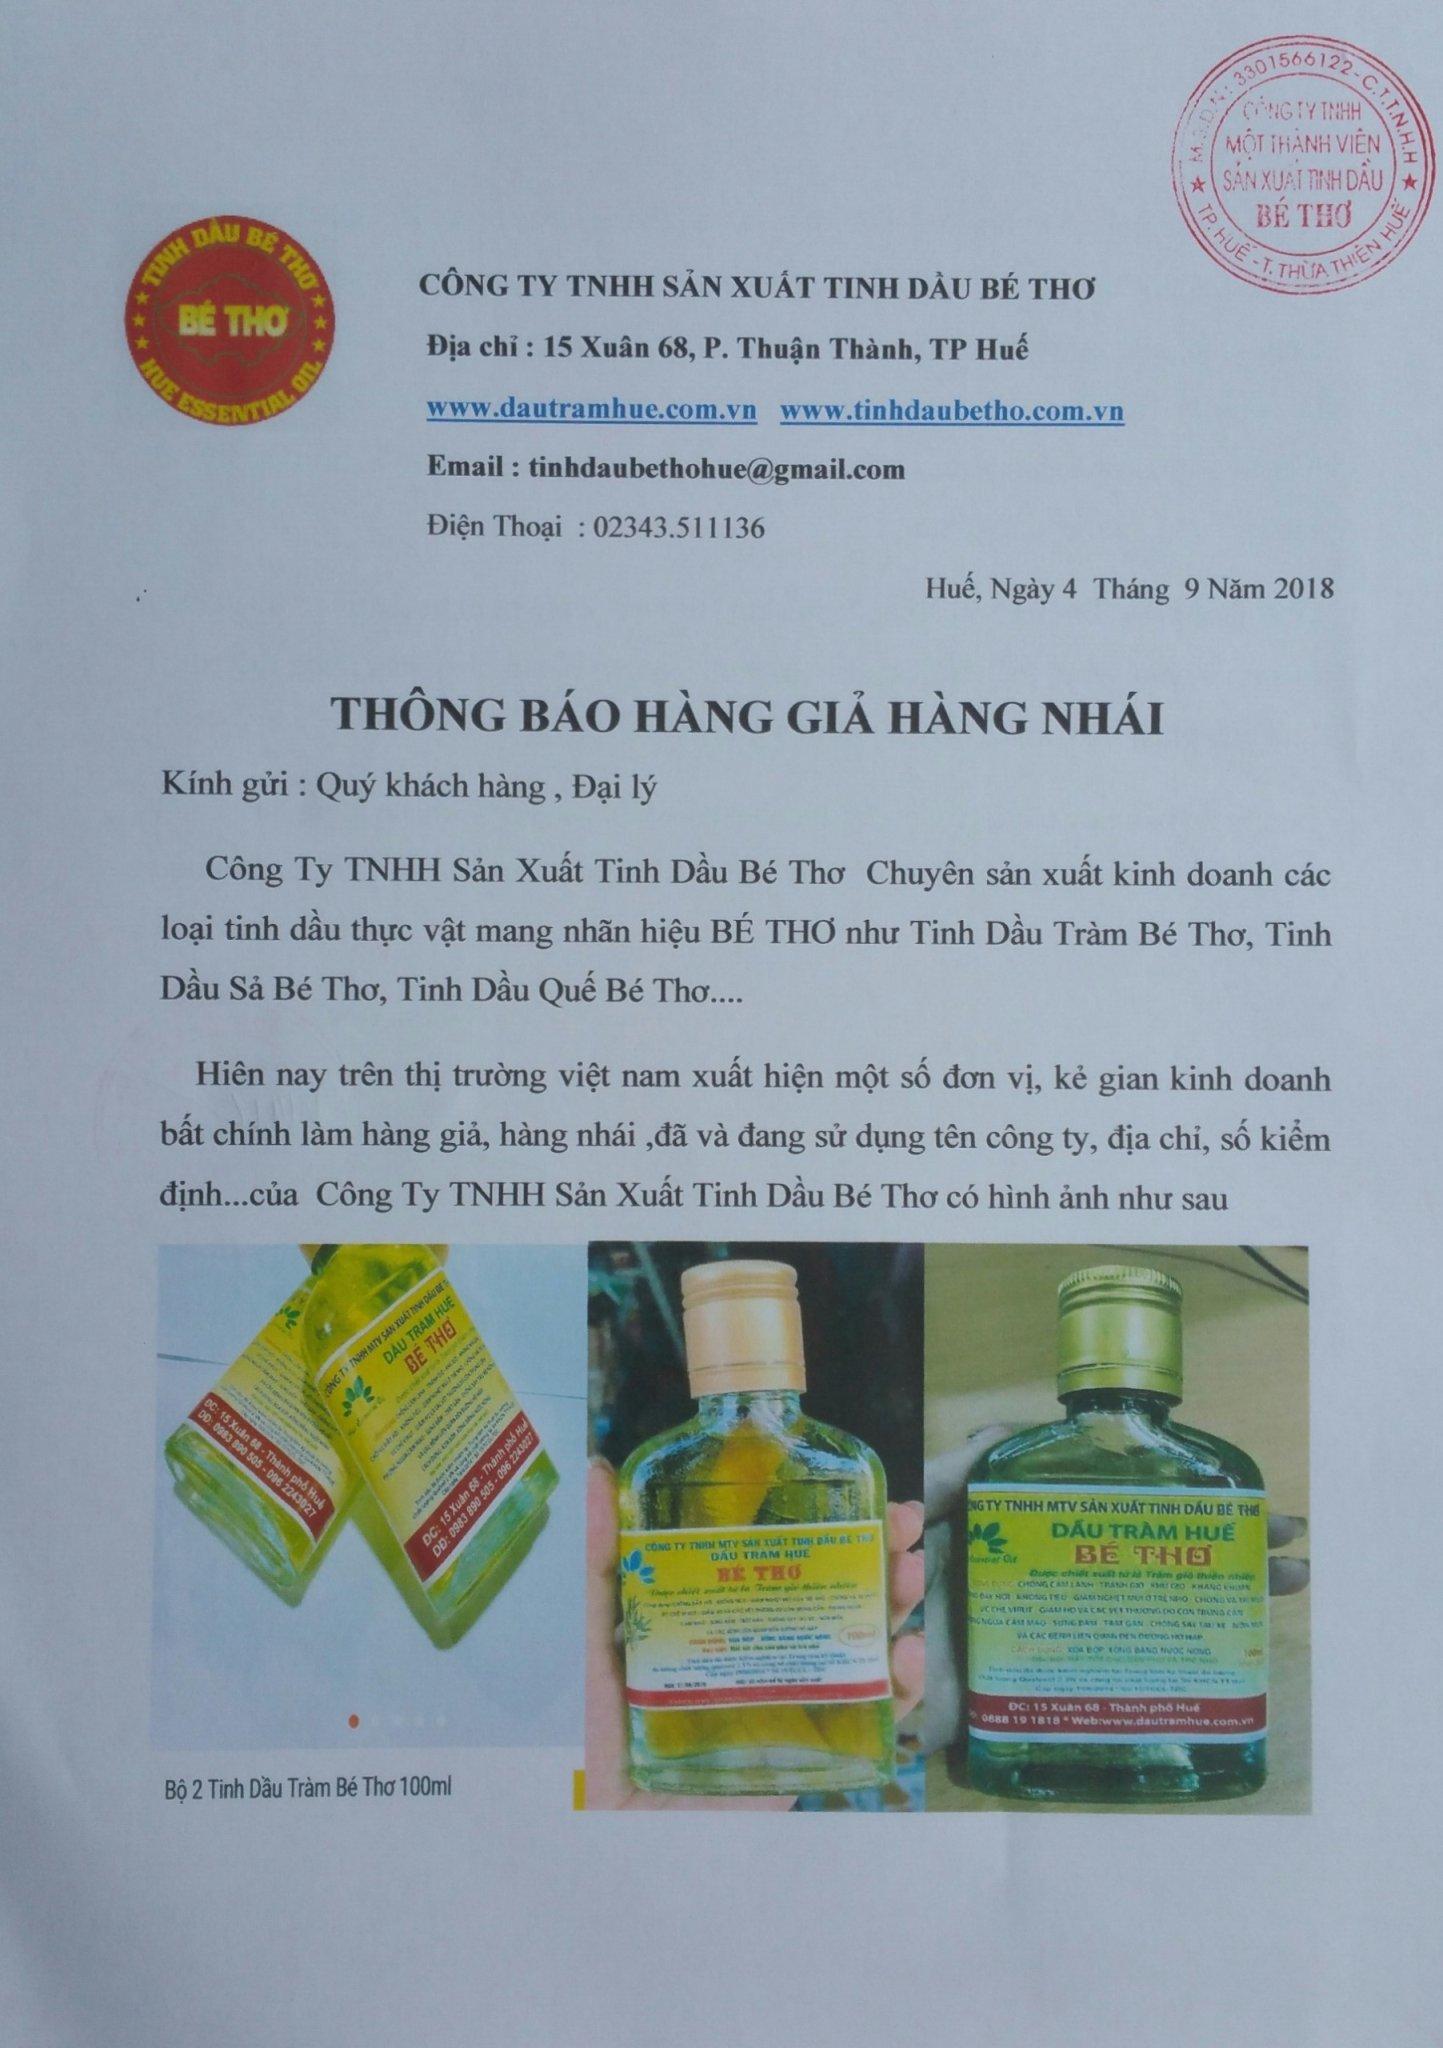 thong-bao-dau-tram-be-tho-hang-gia-hang-nhai